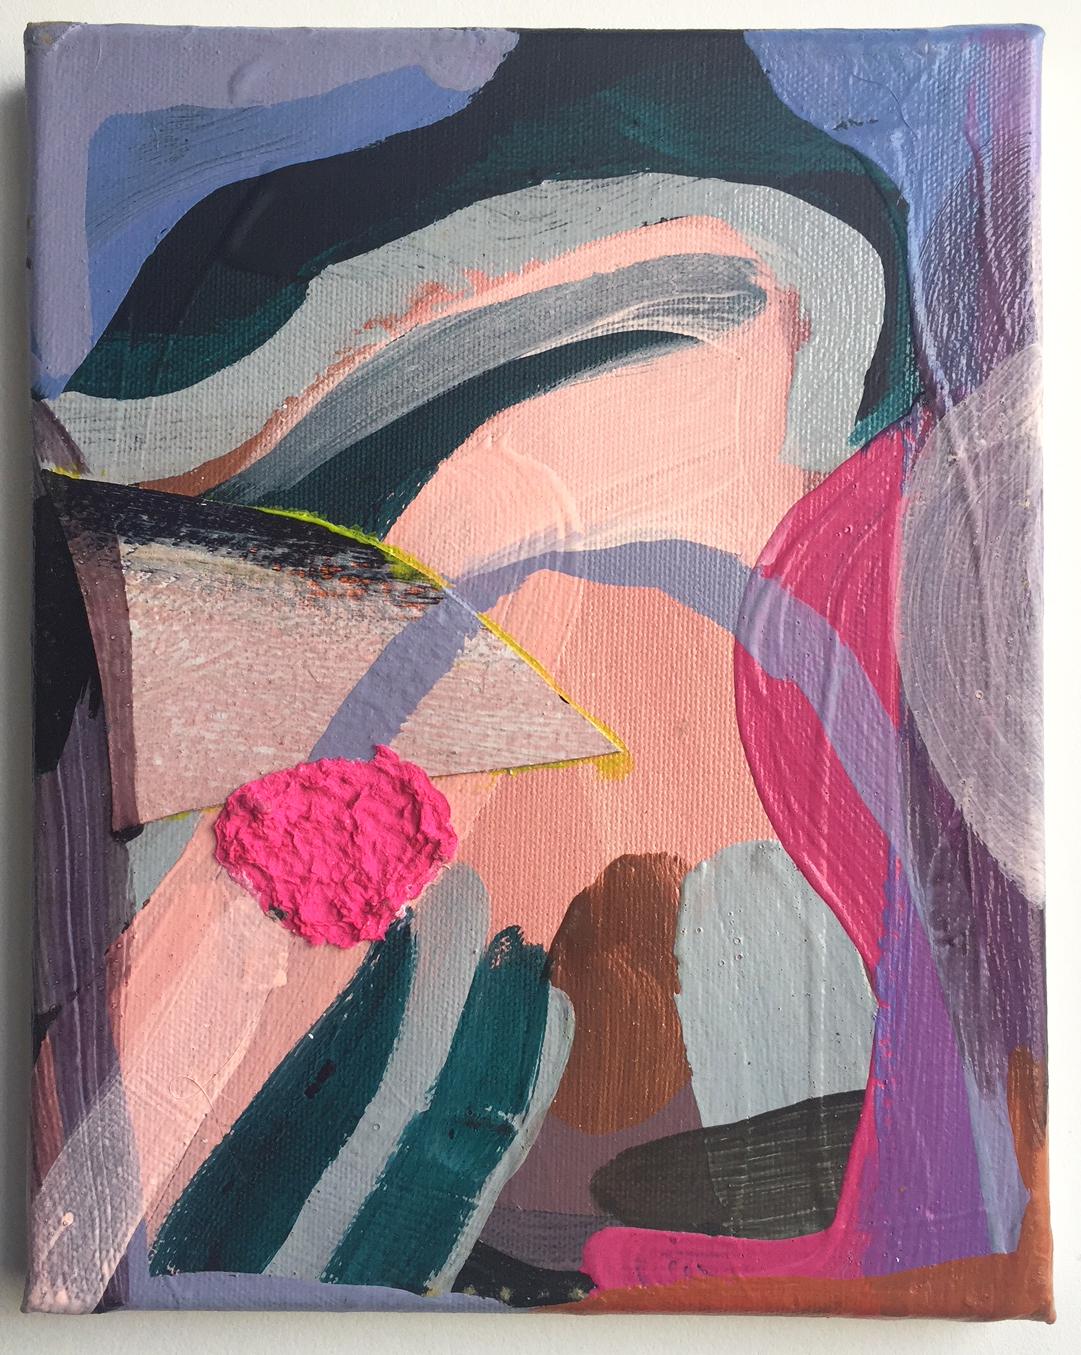 Emily Noelle Lambert      @emilynoellelambert    Handing In , 2015 Acrylic on canvas 10x8 in.